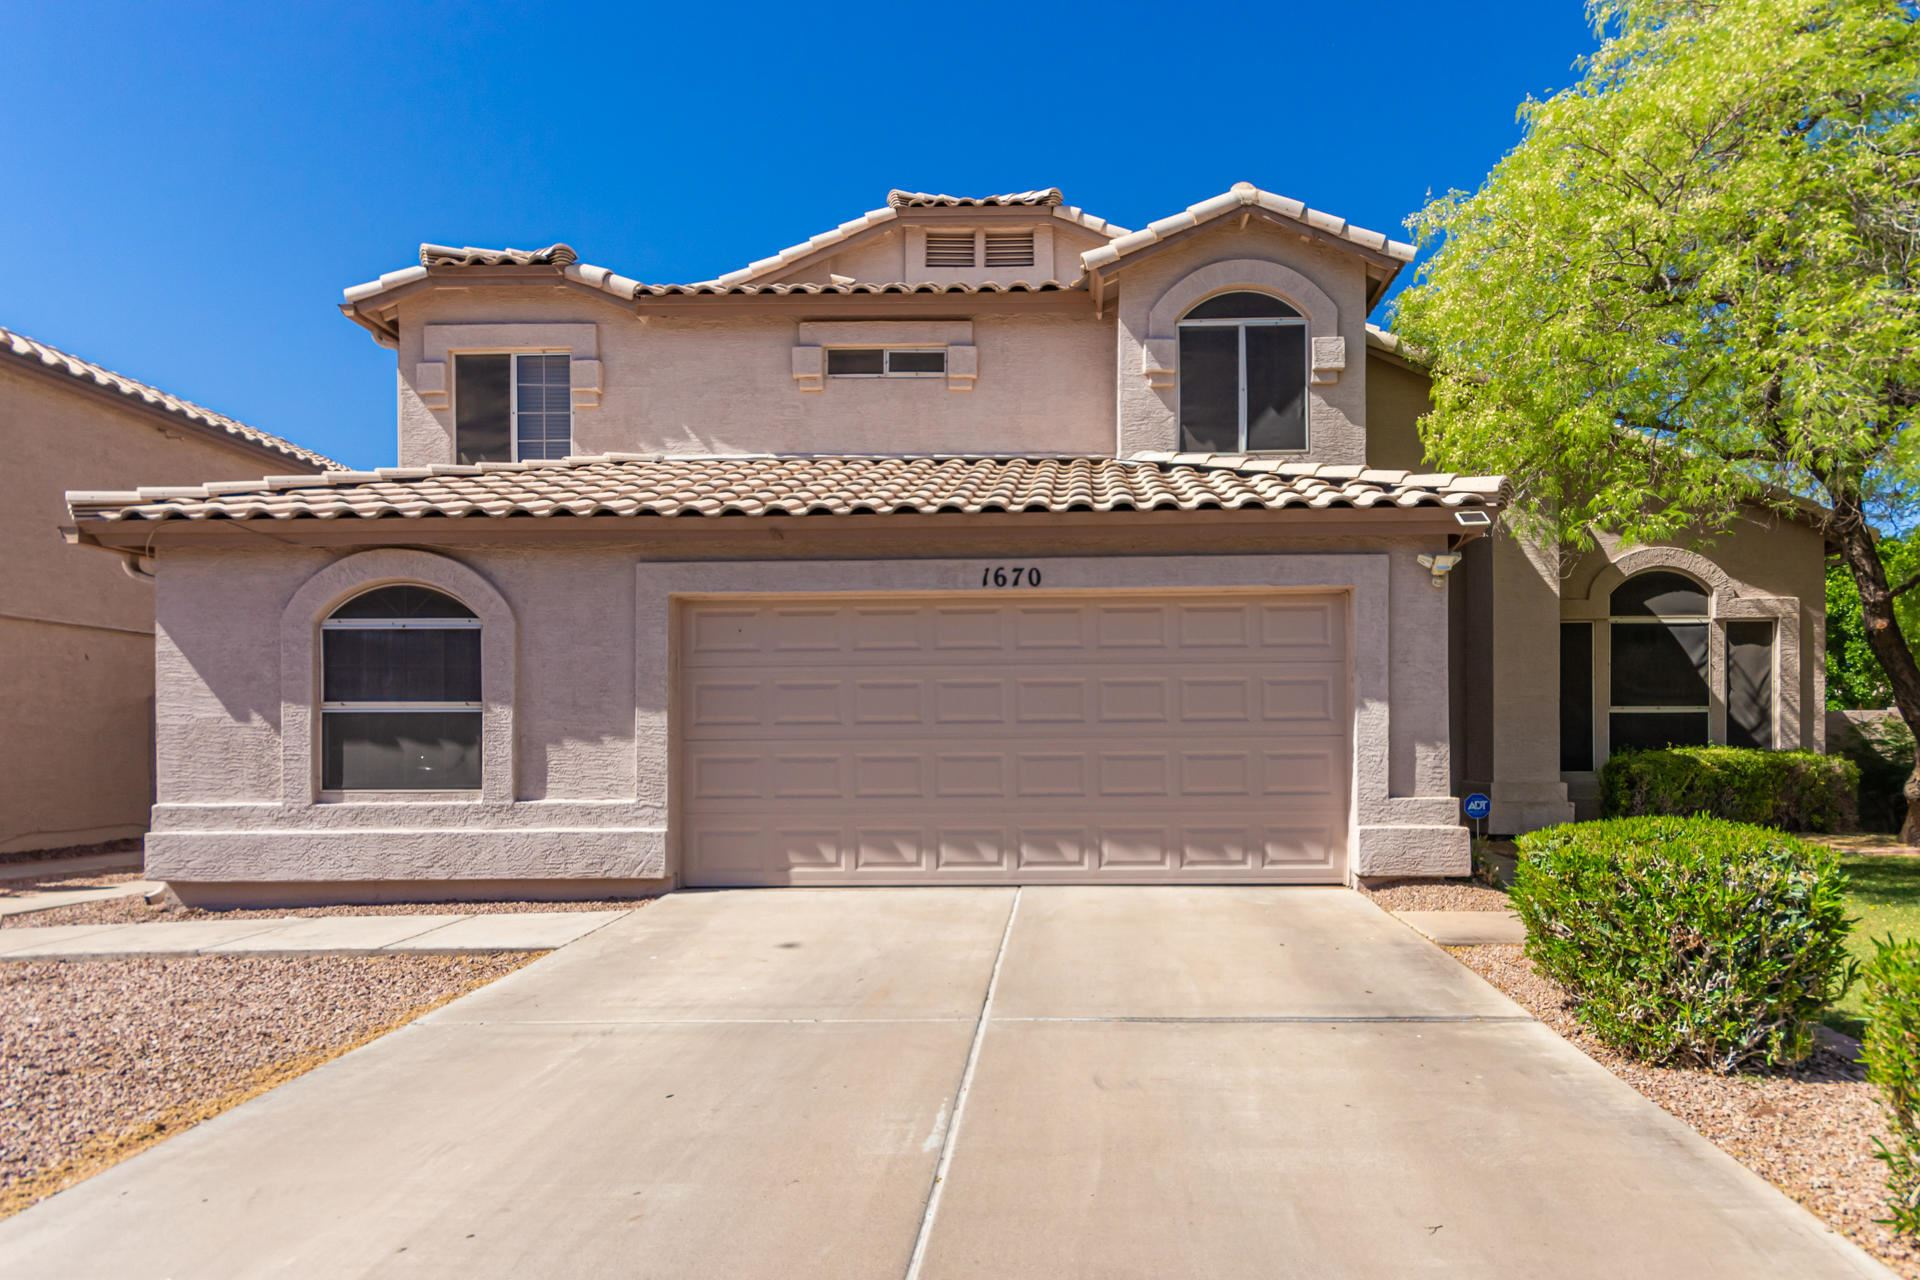 Photo of 1670 W HOUSTON Avenue, Gilbert, AZ 85233 (MLS # 6231631)